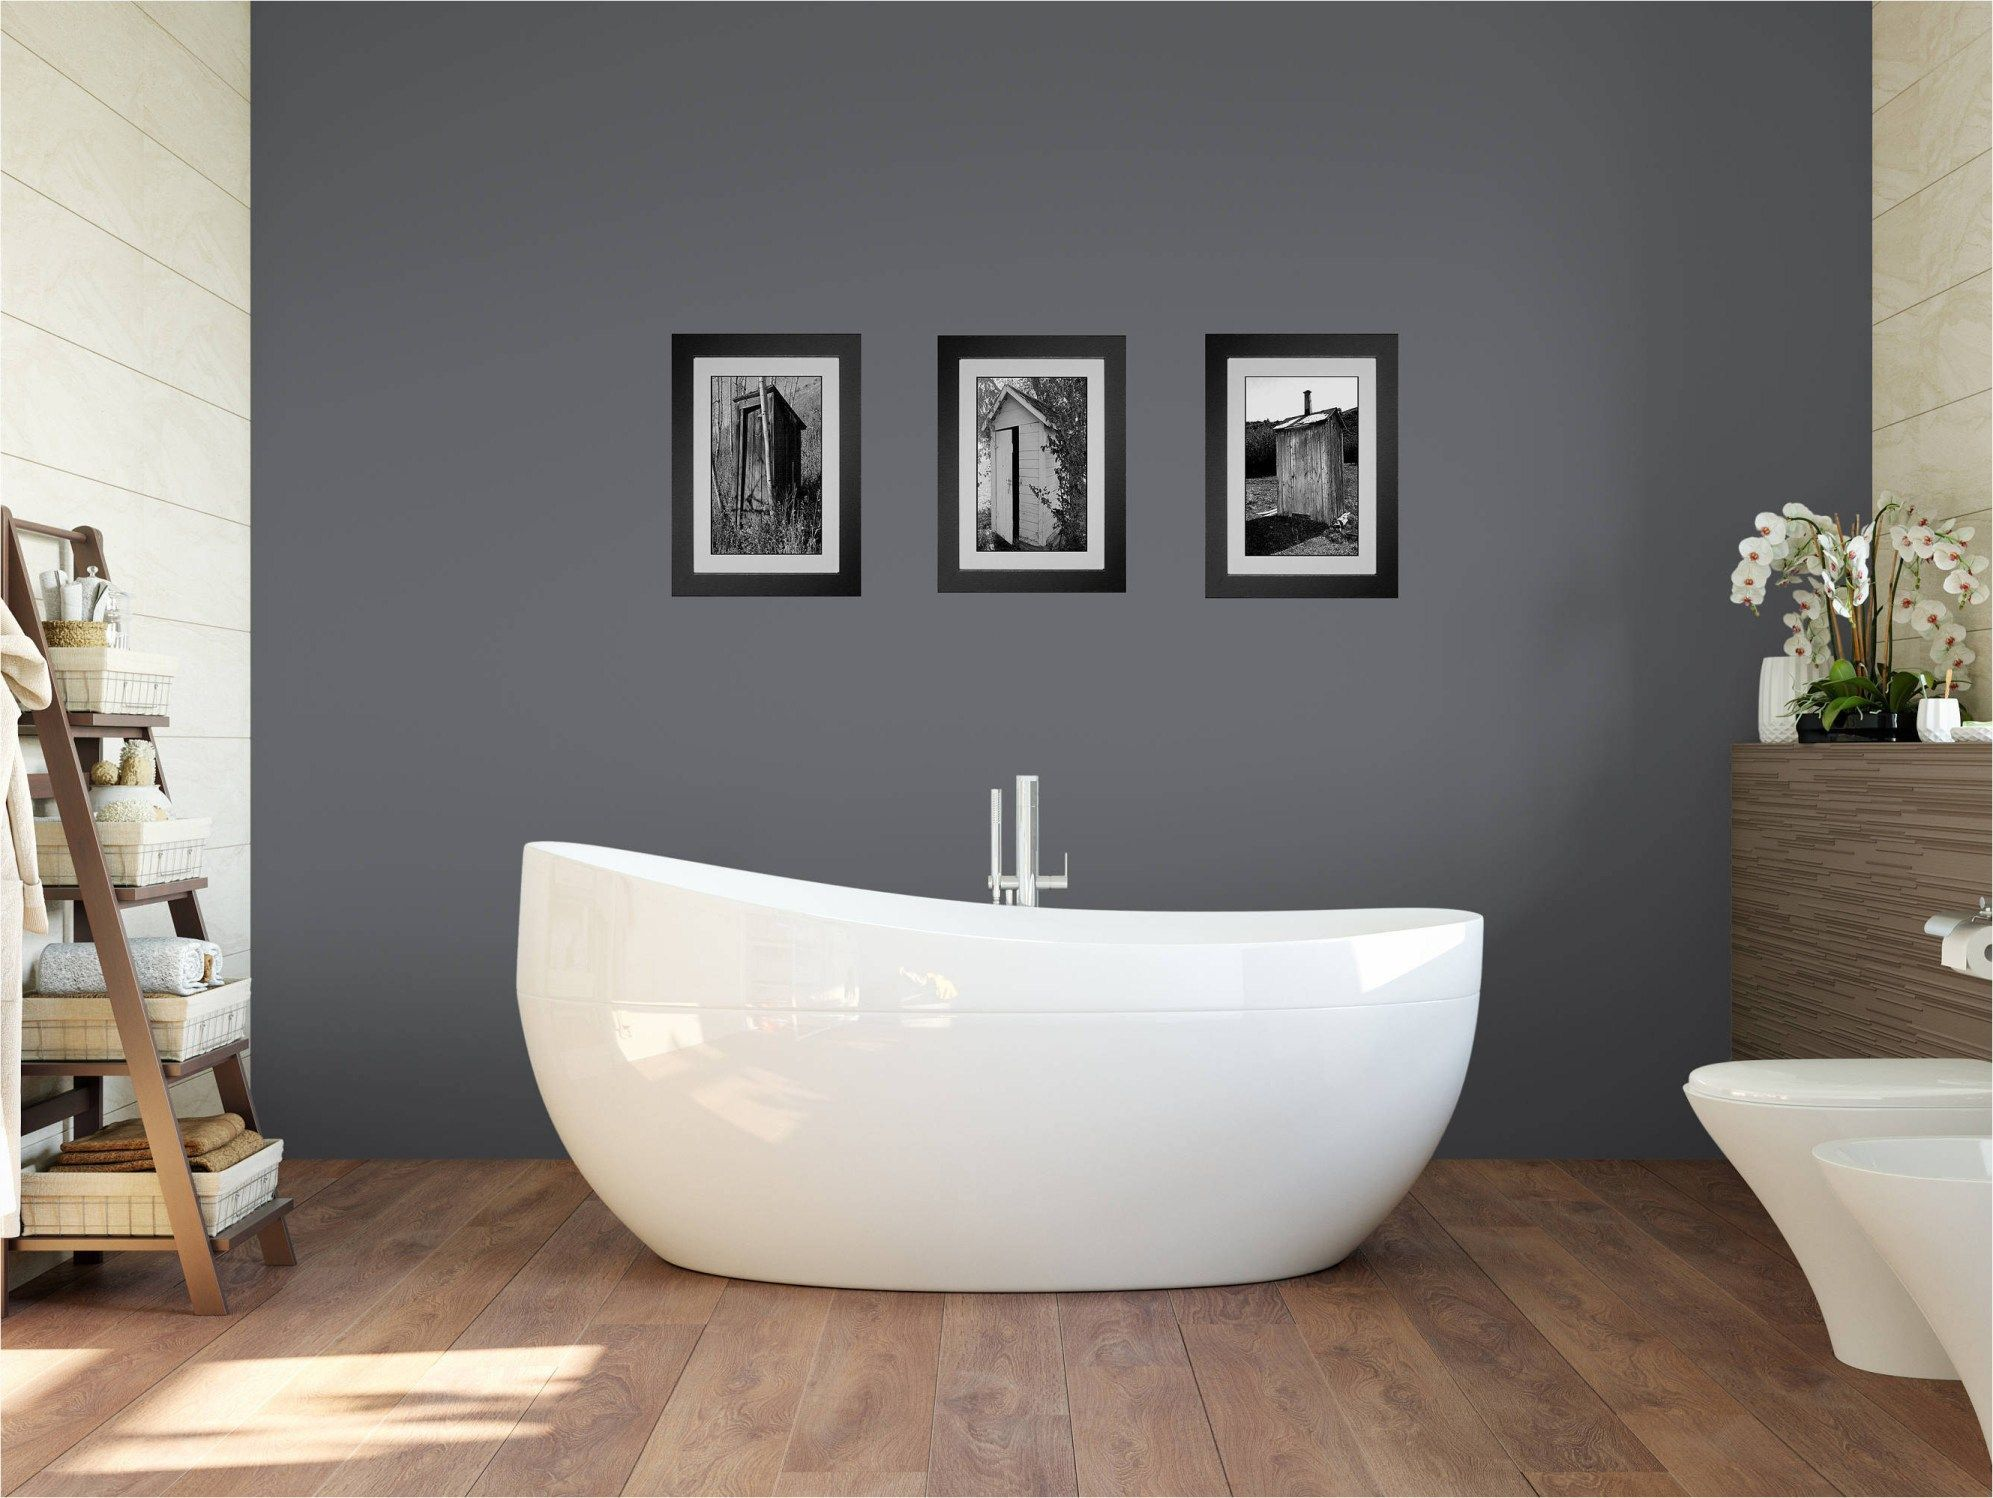 Funny Bathroom Signs Set Of 4 Unframed 8x10s Bathroom